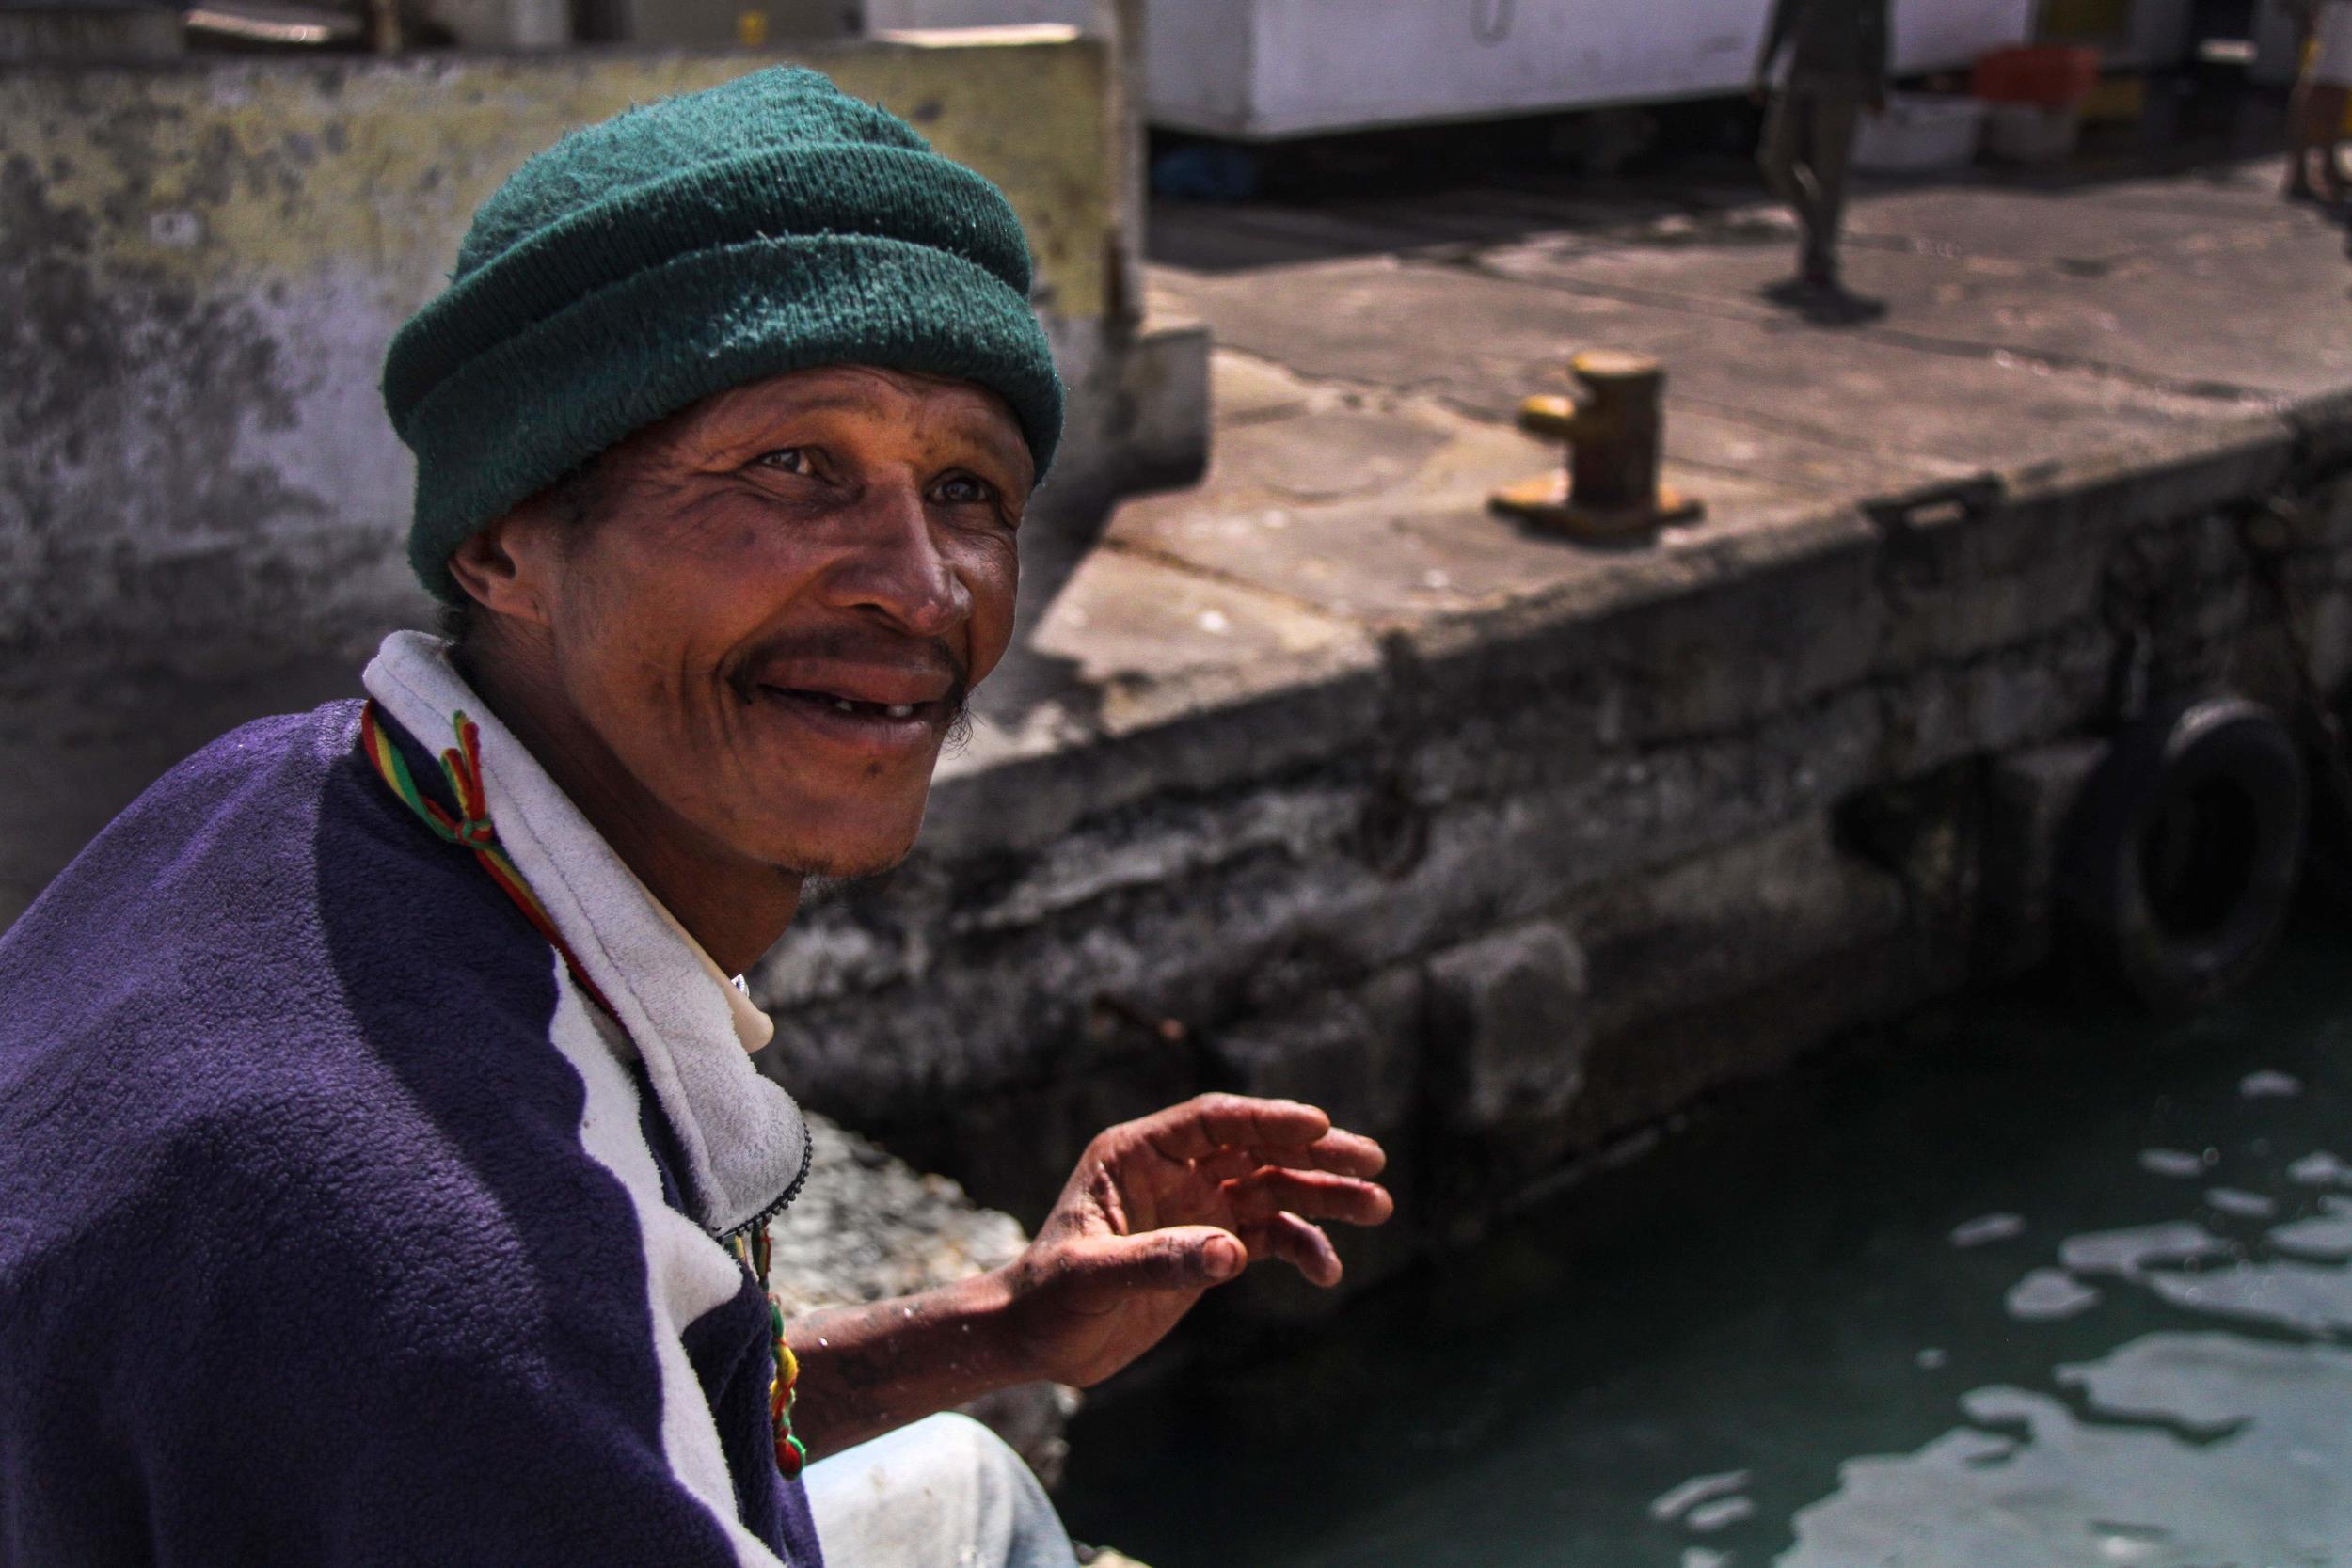 Fisherman3web.jpg